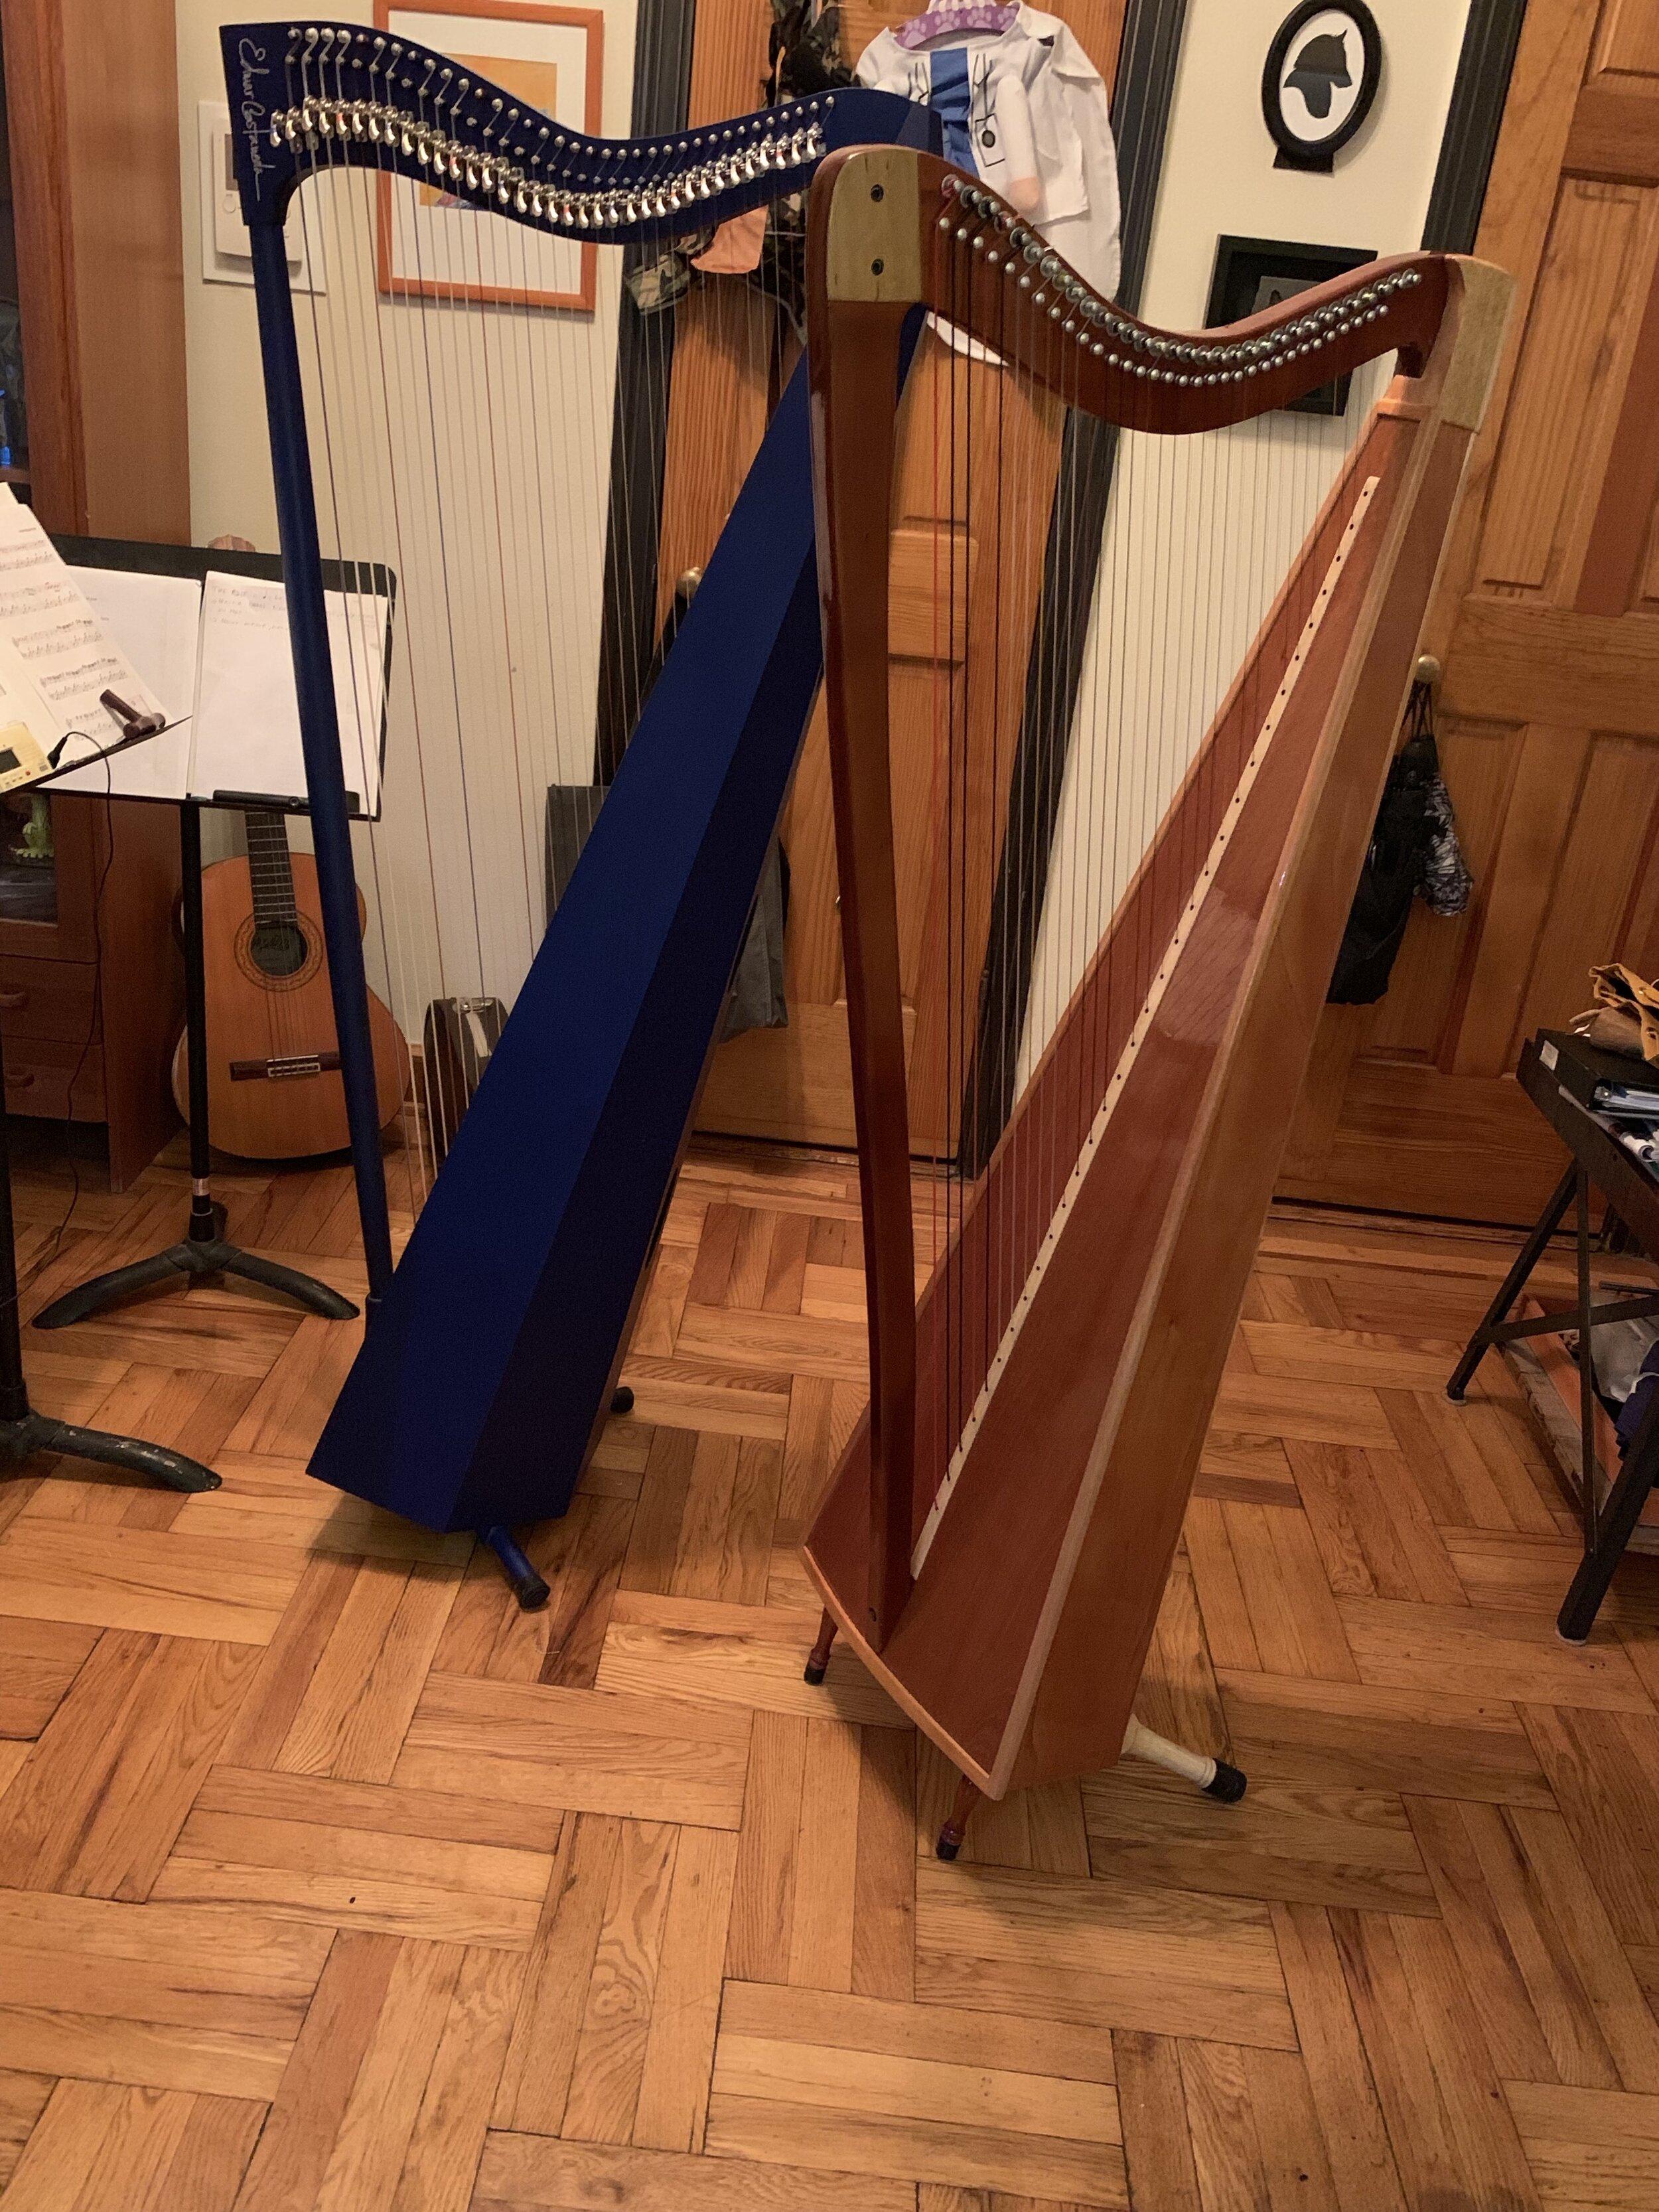 My two llanera harps